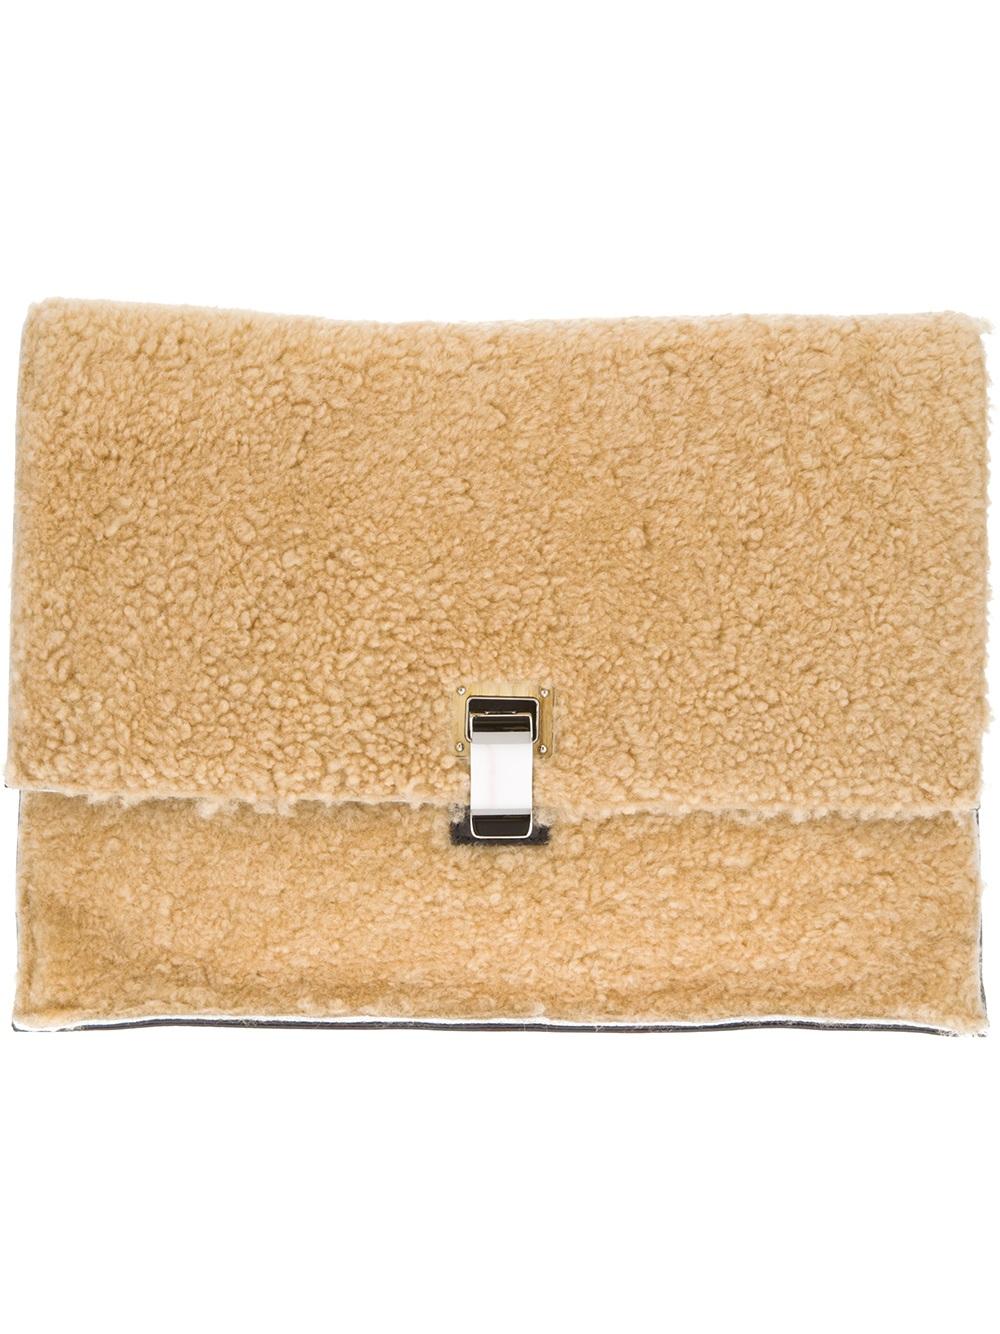 Pre-owned - Lunch shearling clutch bag Proenza Schouler I8e2Mq